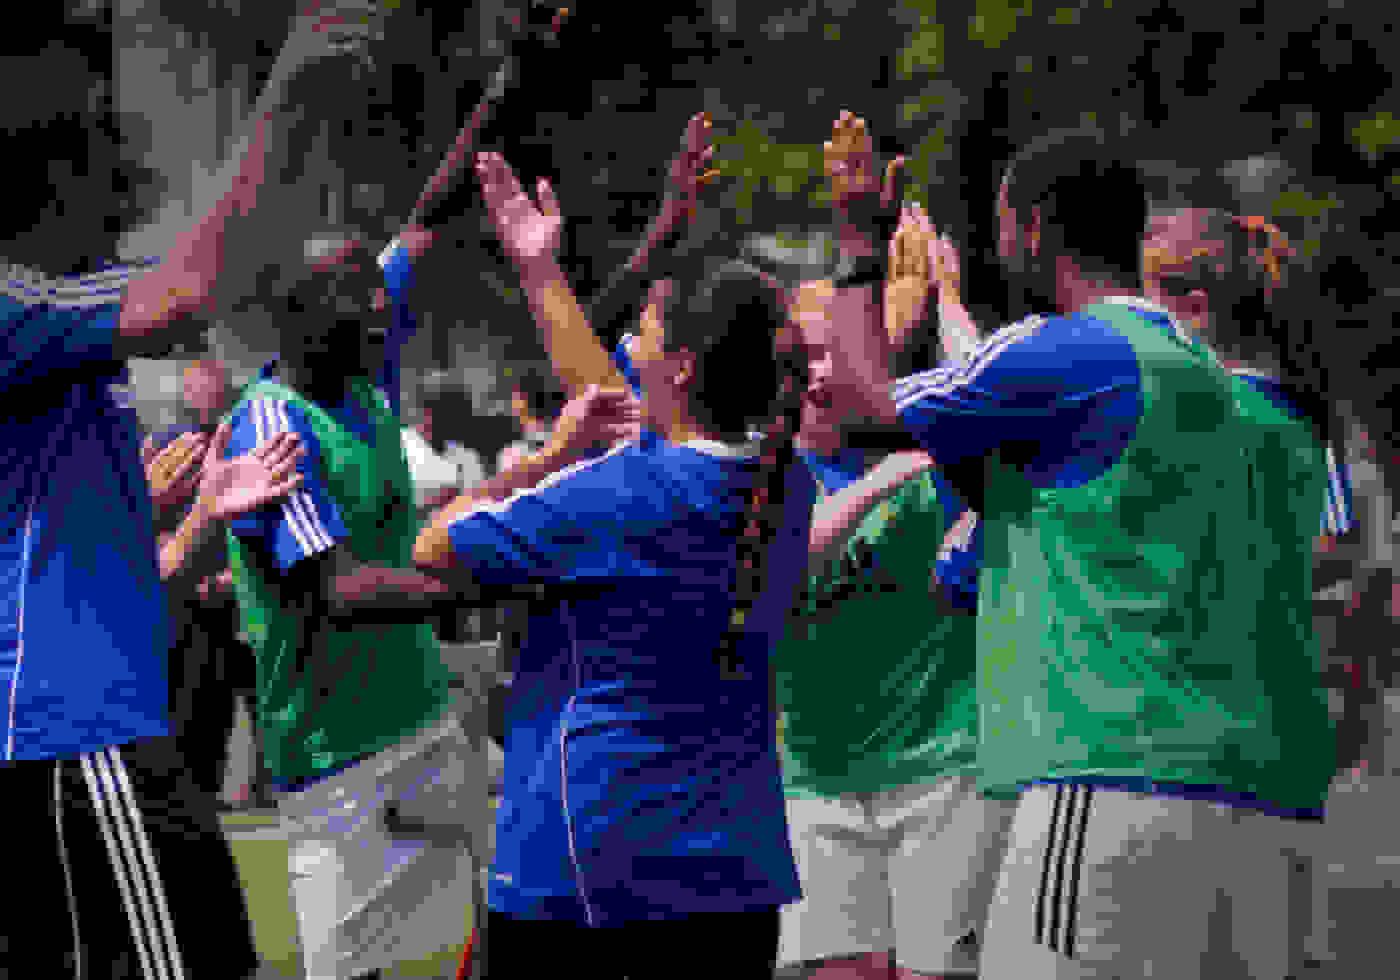 adidas football collective x Common Goal